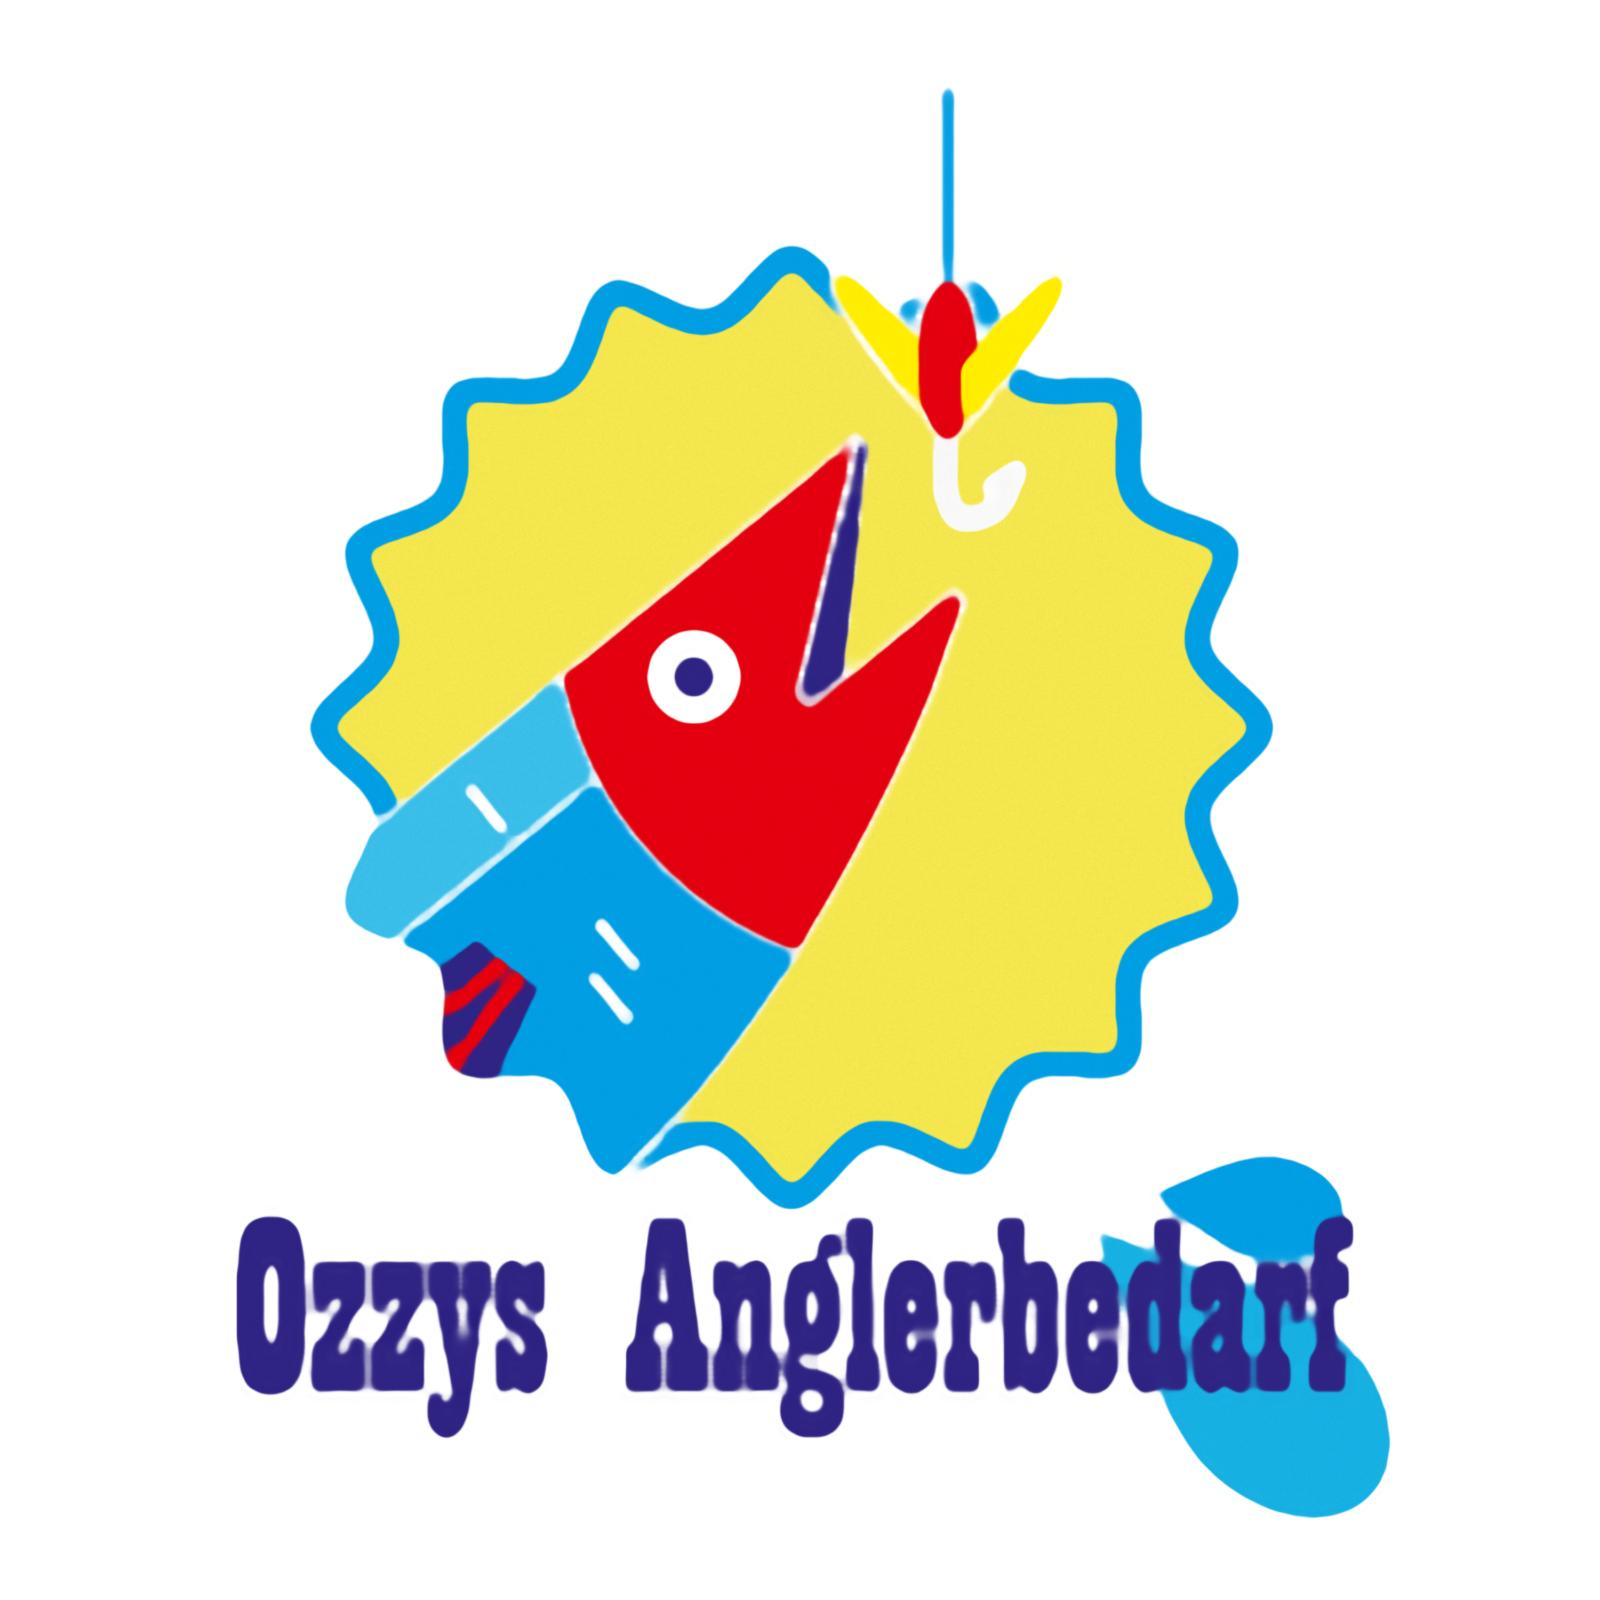 Logo Ozzys Anglerbedarf - SmillaEnlarger, painted | BANNERKÖNIG